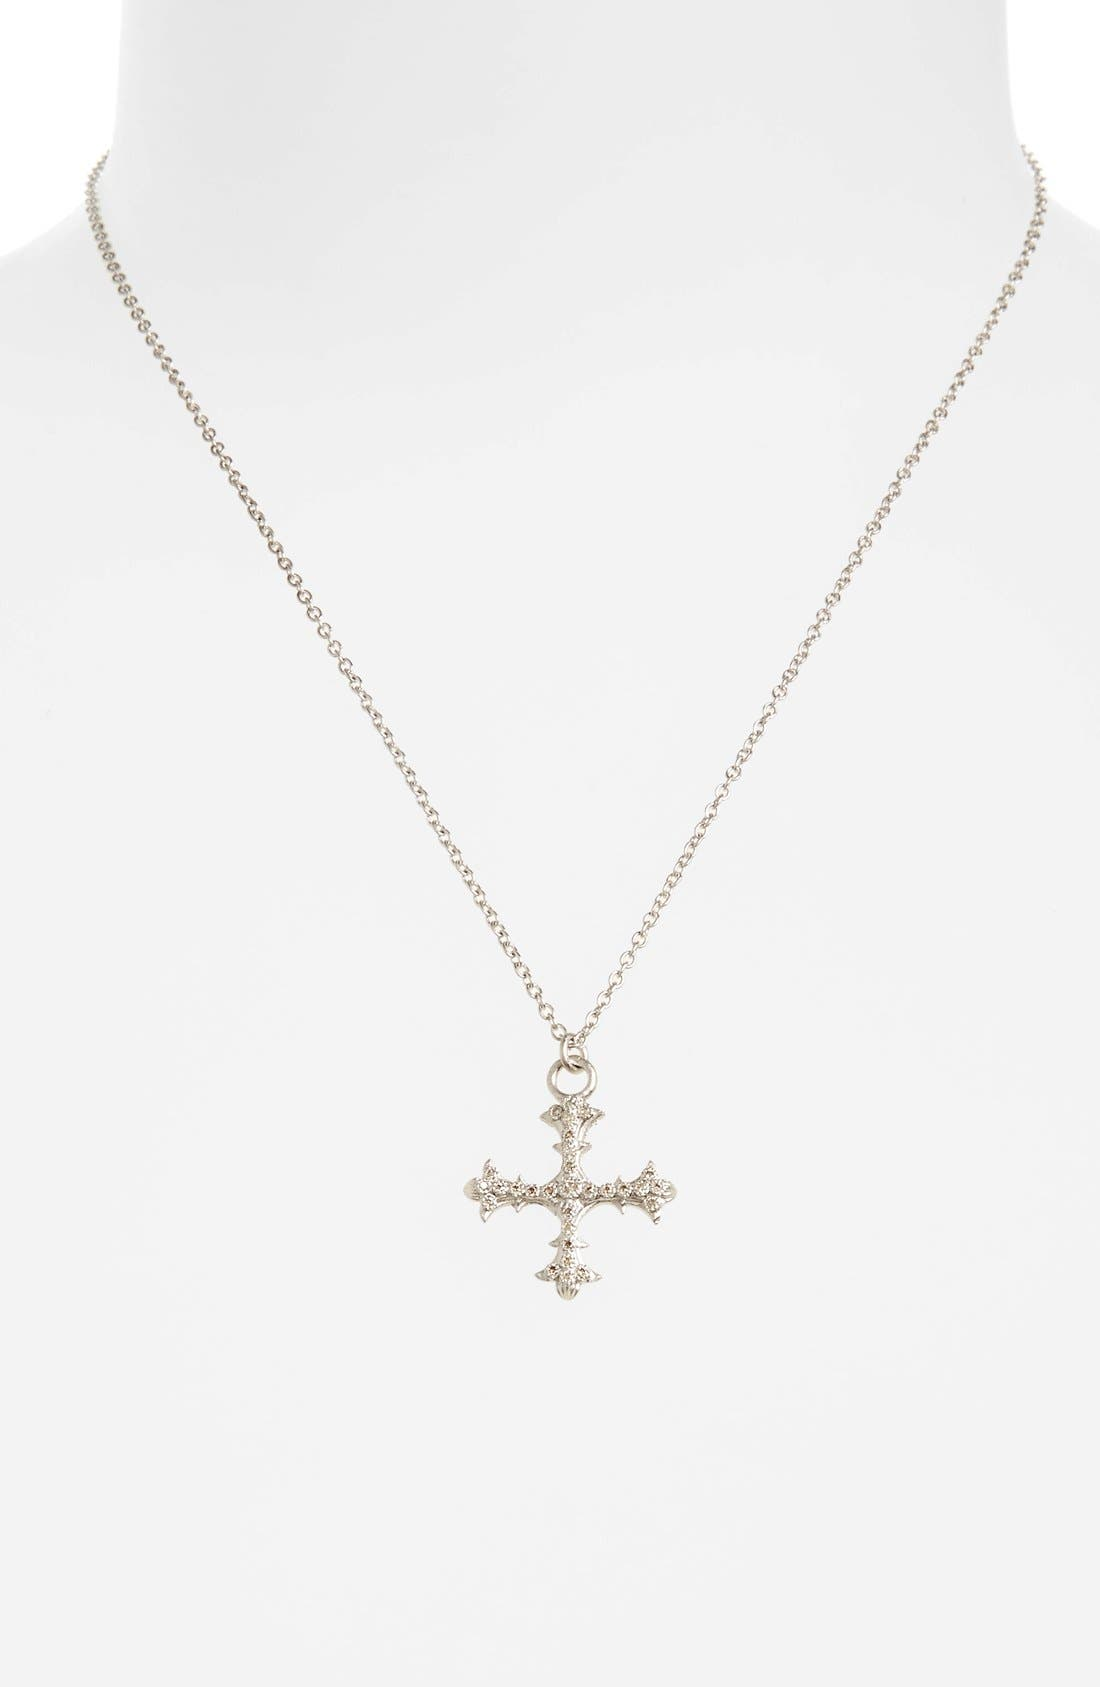 Old World Diamond Cross Pendant Necklace,                             Alternate thumbnail 2, color,                             SILVER